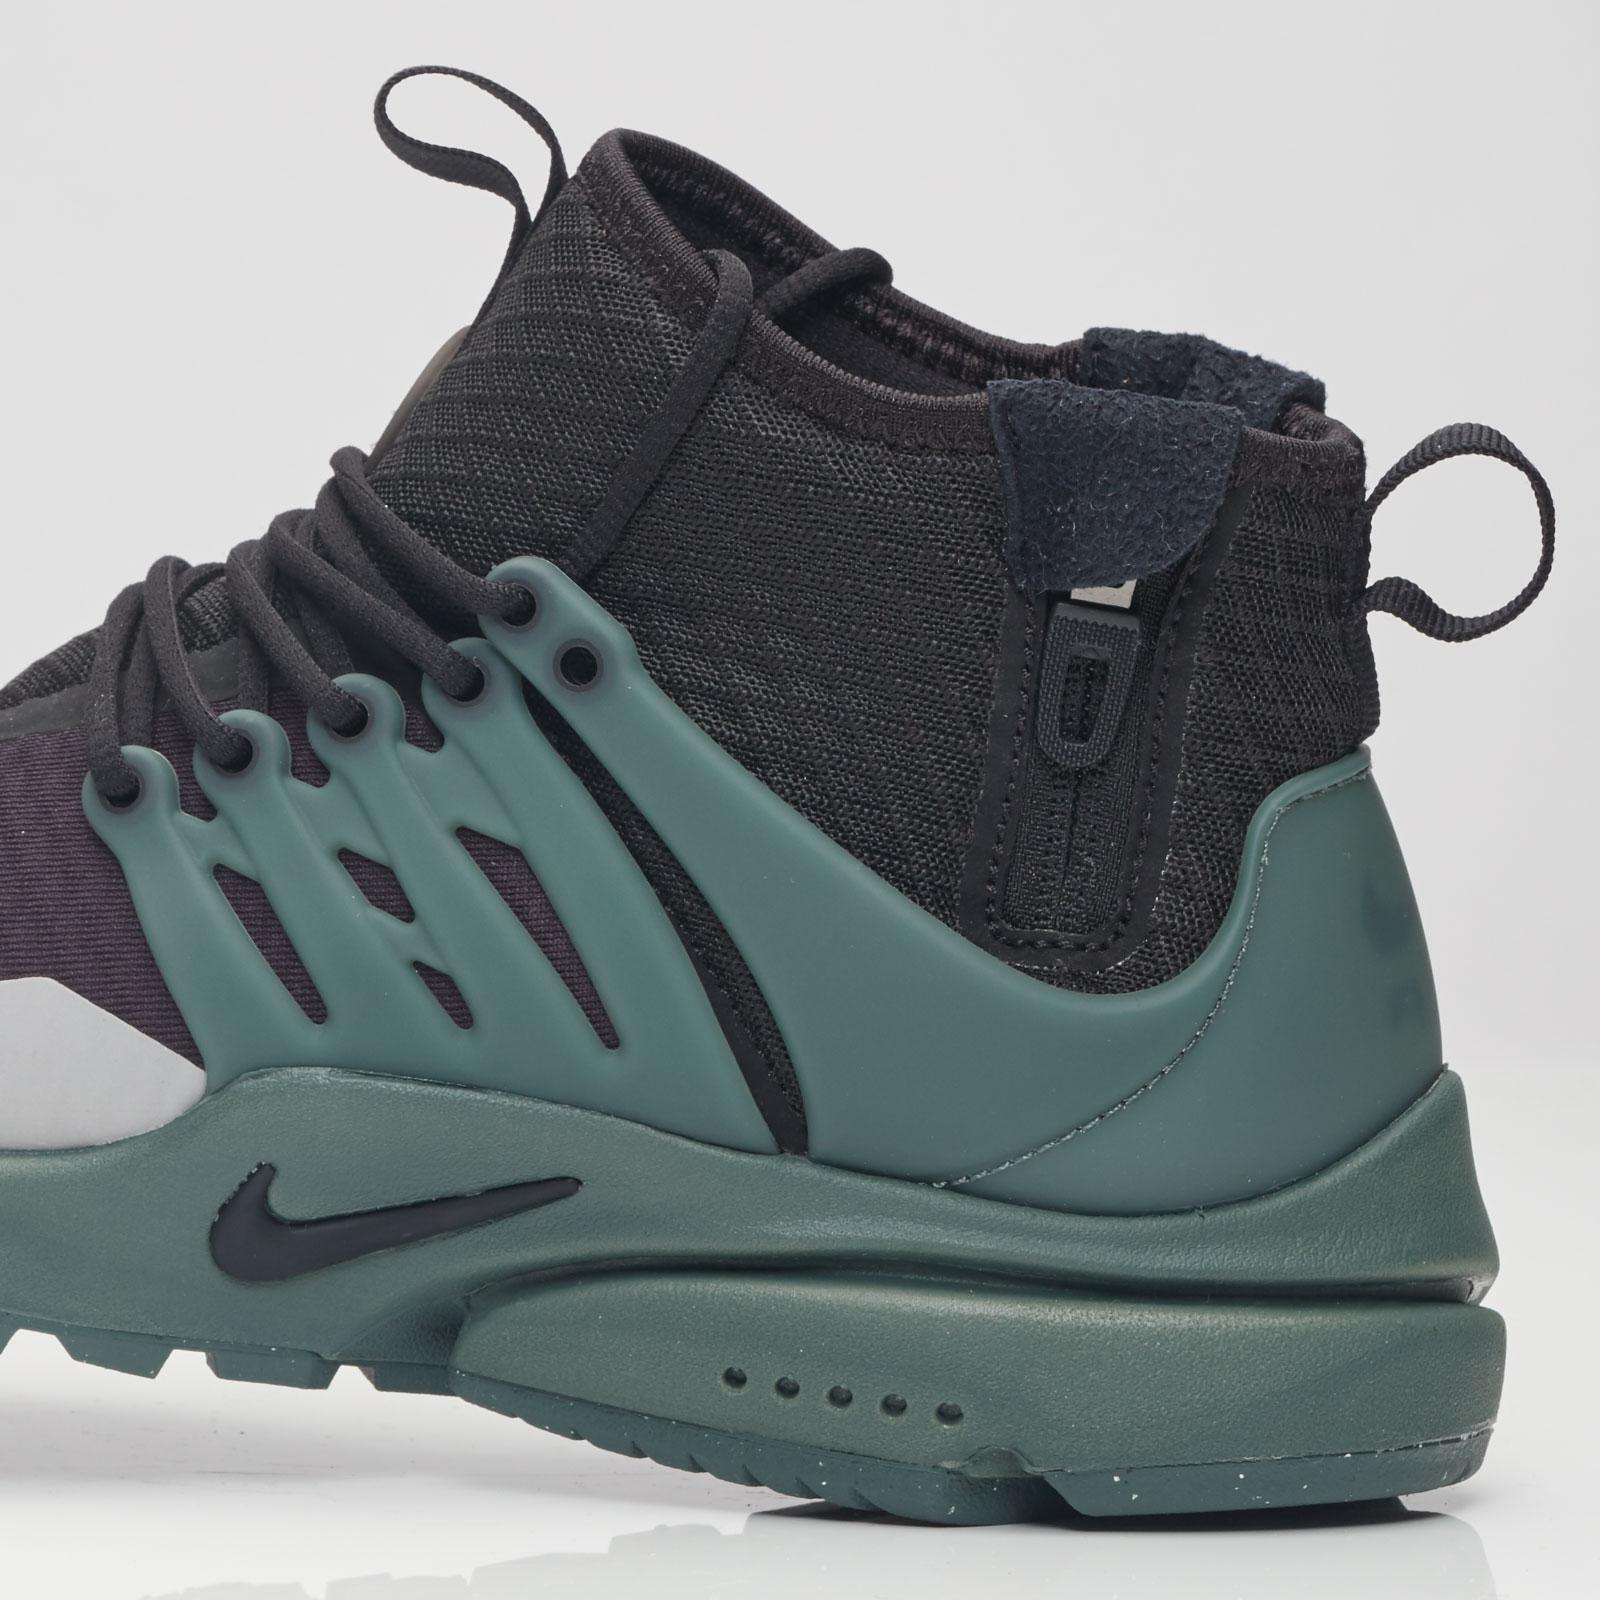 online retailer 9eddc 76abb Nike Sportswear Air Presto Mid SP - 6. Close